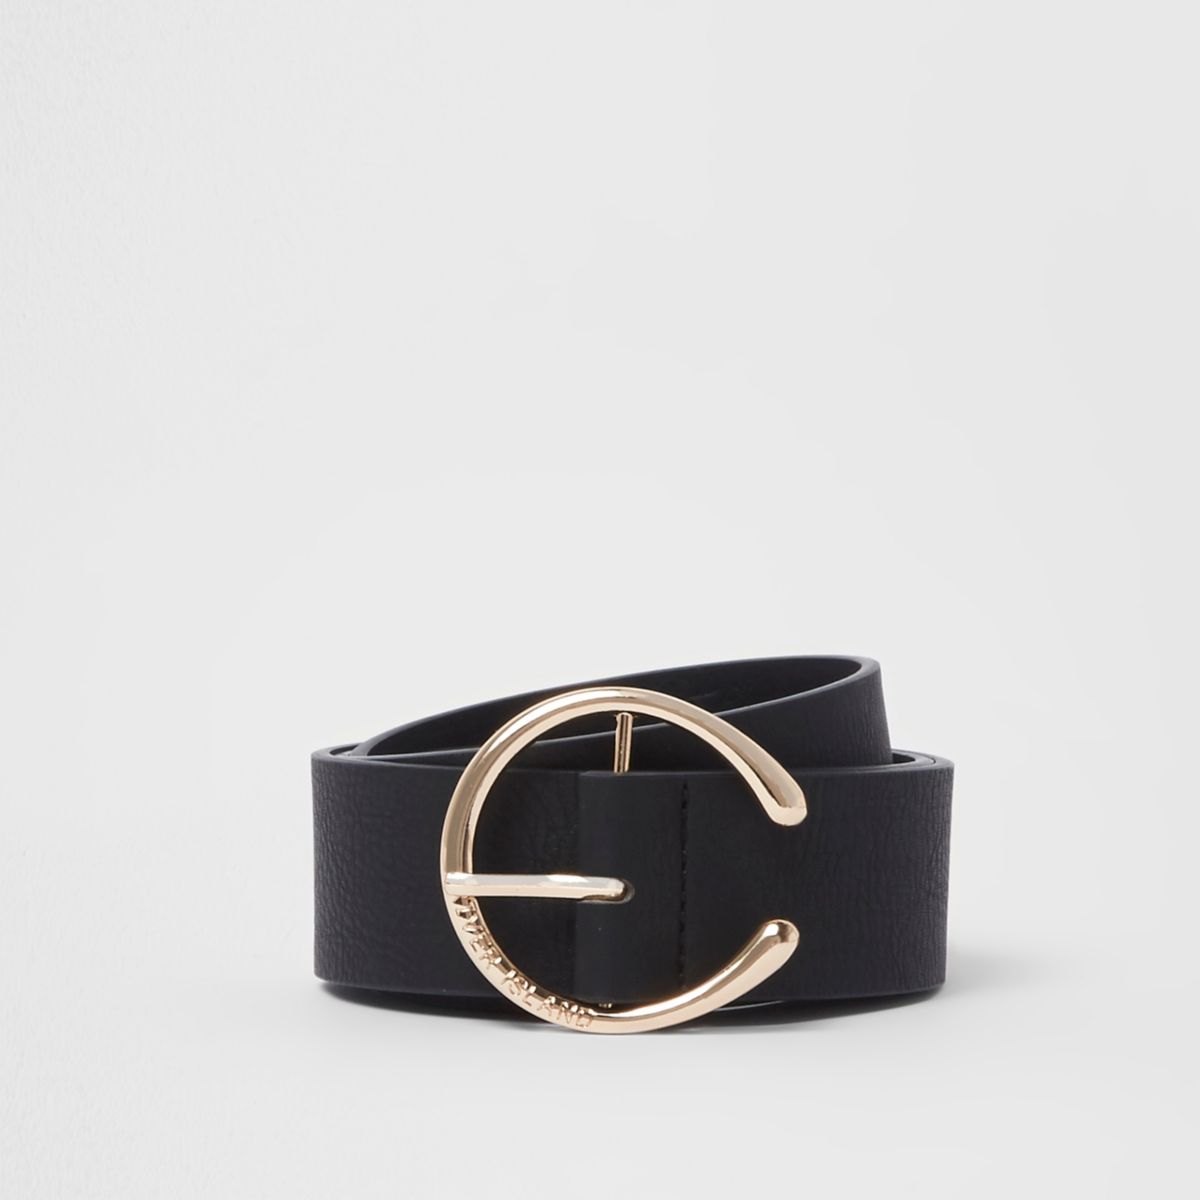 Black curved horseshoe buckle jeans belt